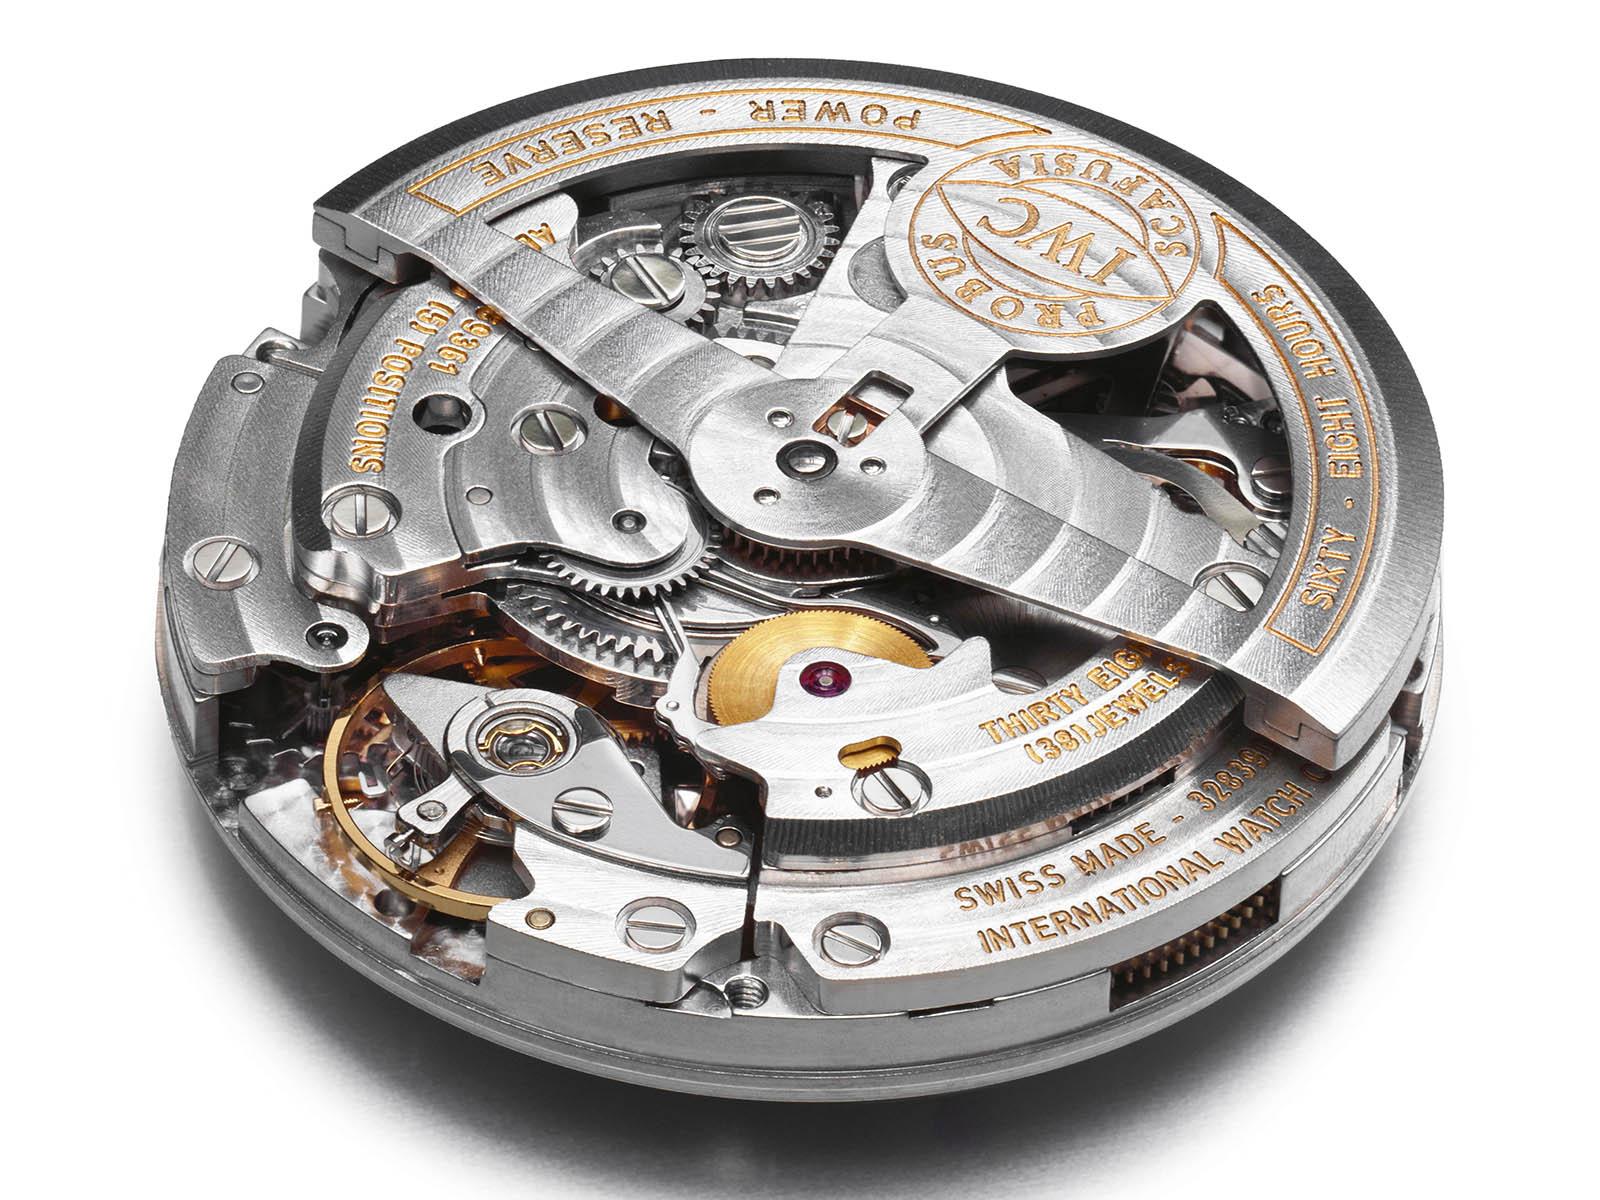 iw381802-iwc-ingenieur-perpetual-calendar-digital-date-month-titanium-3.jpg